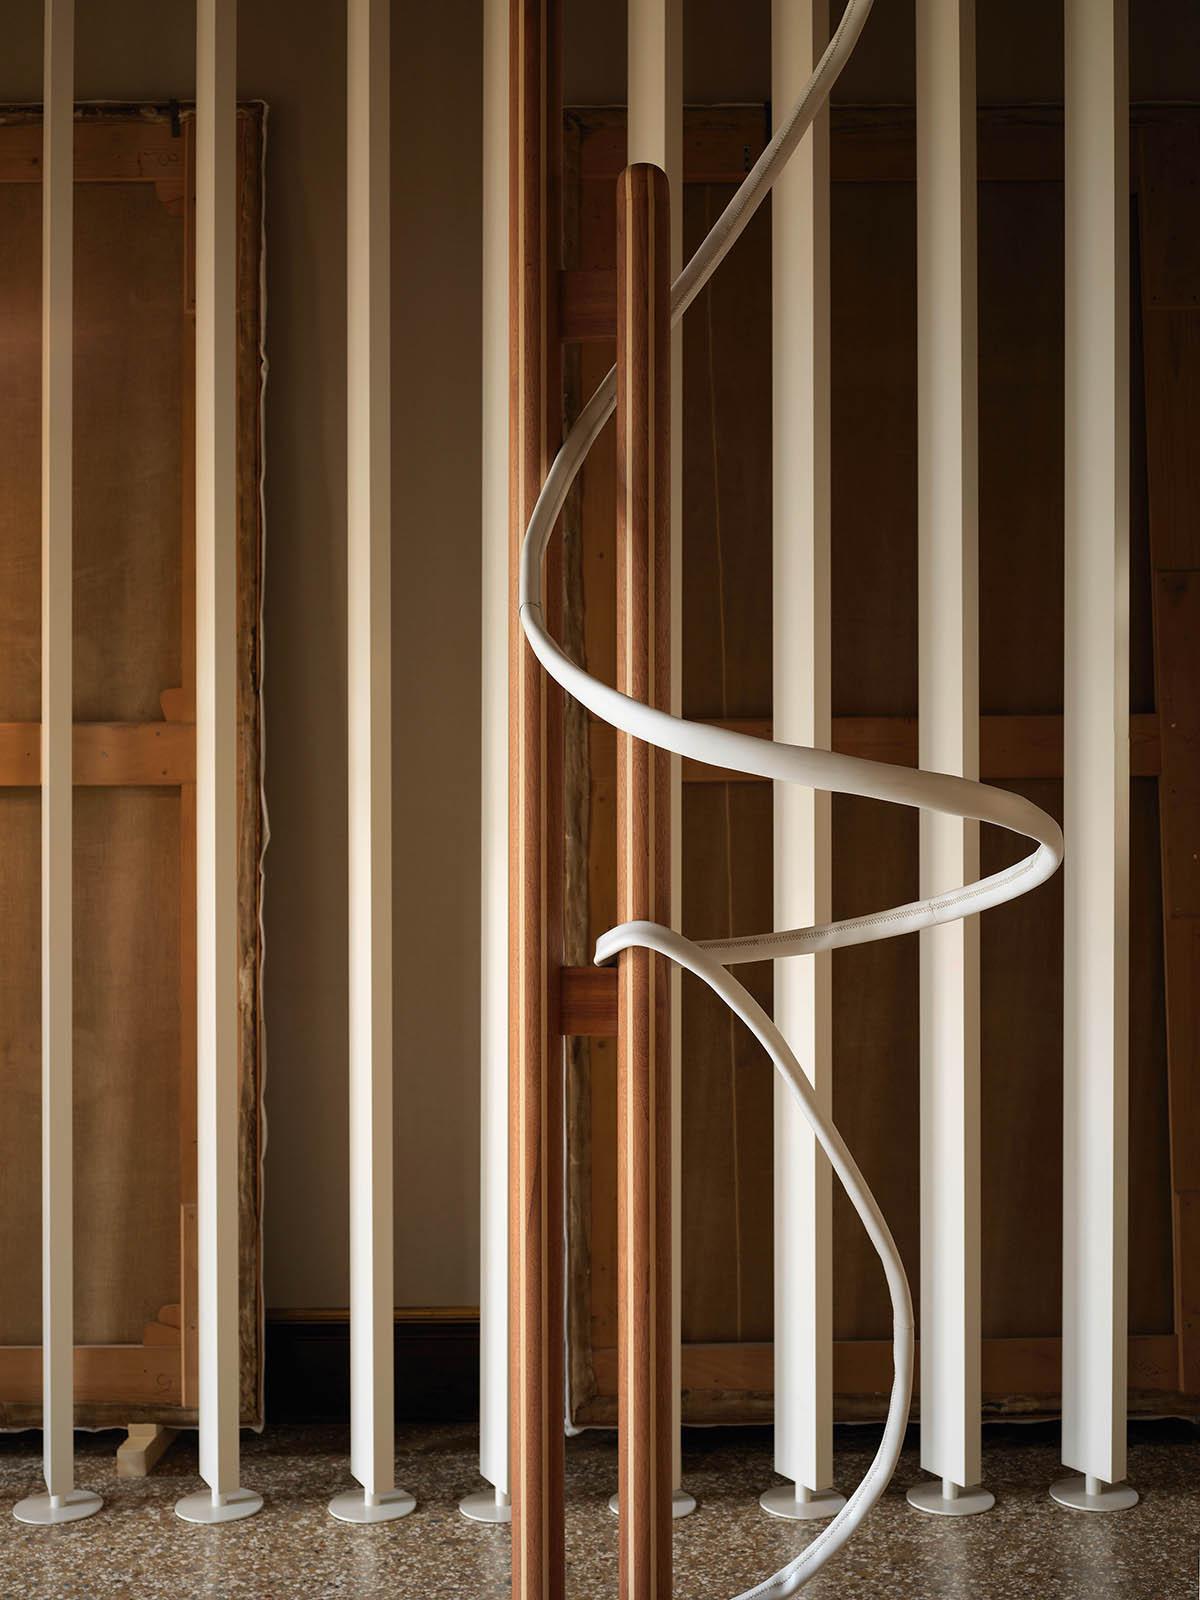 Links: Leonor Antunes, a seam, a surface, a hinge or a knot (Detail), offizieller Beitrag für die 58. Biennale di Venezia, 2019